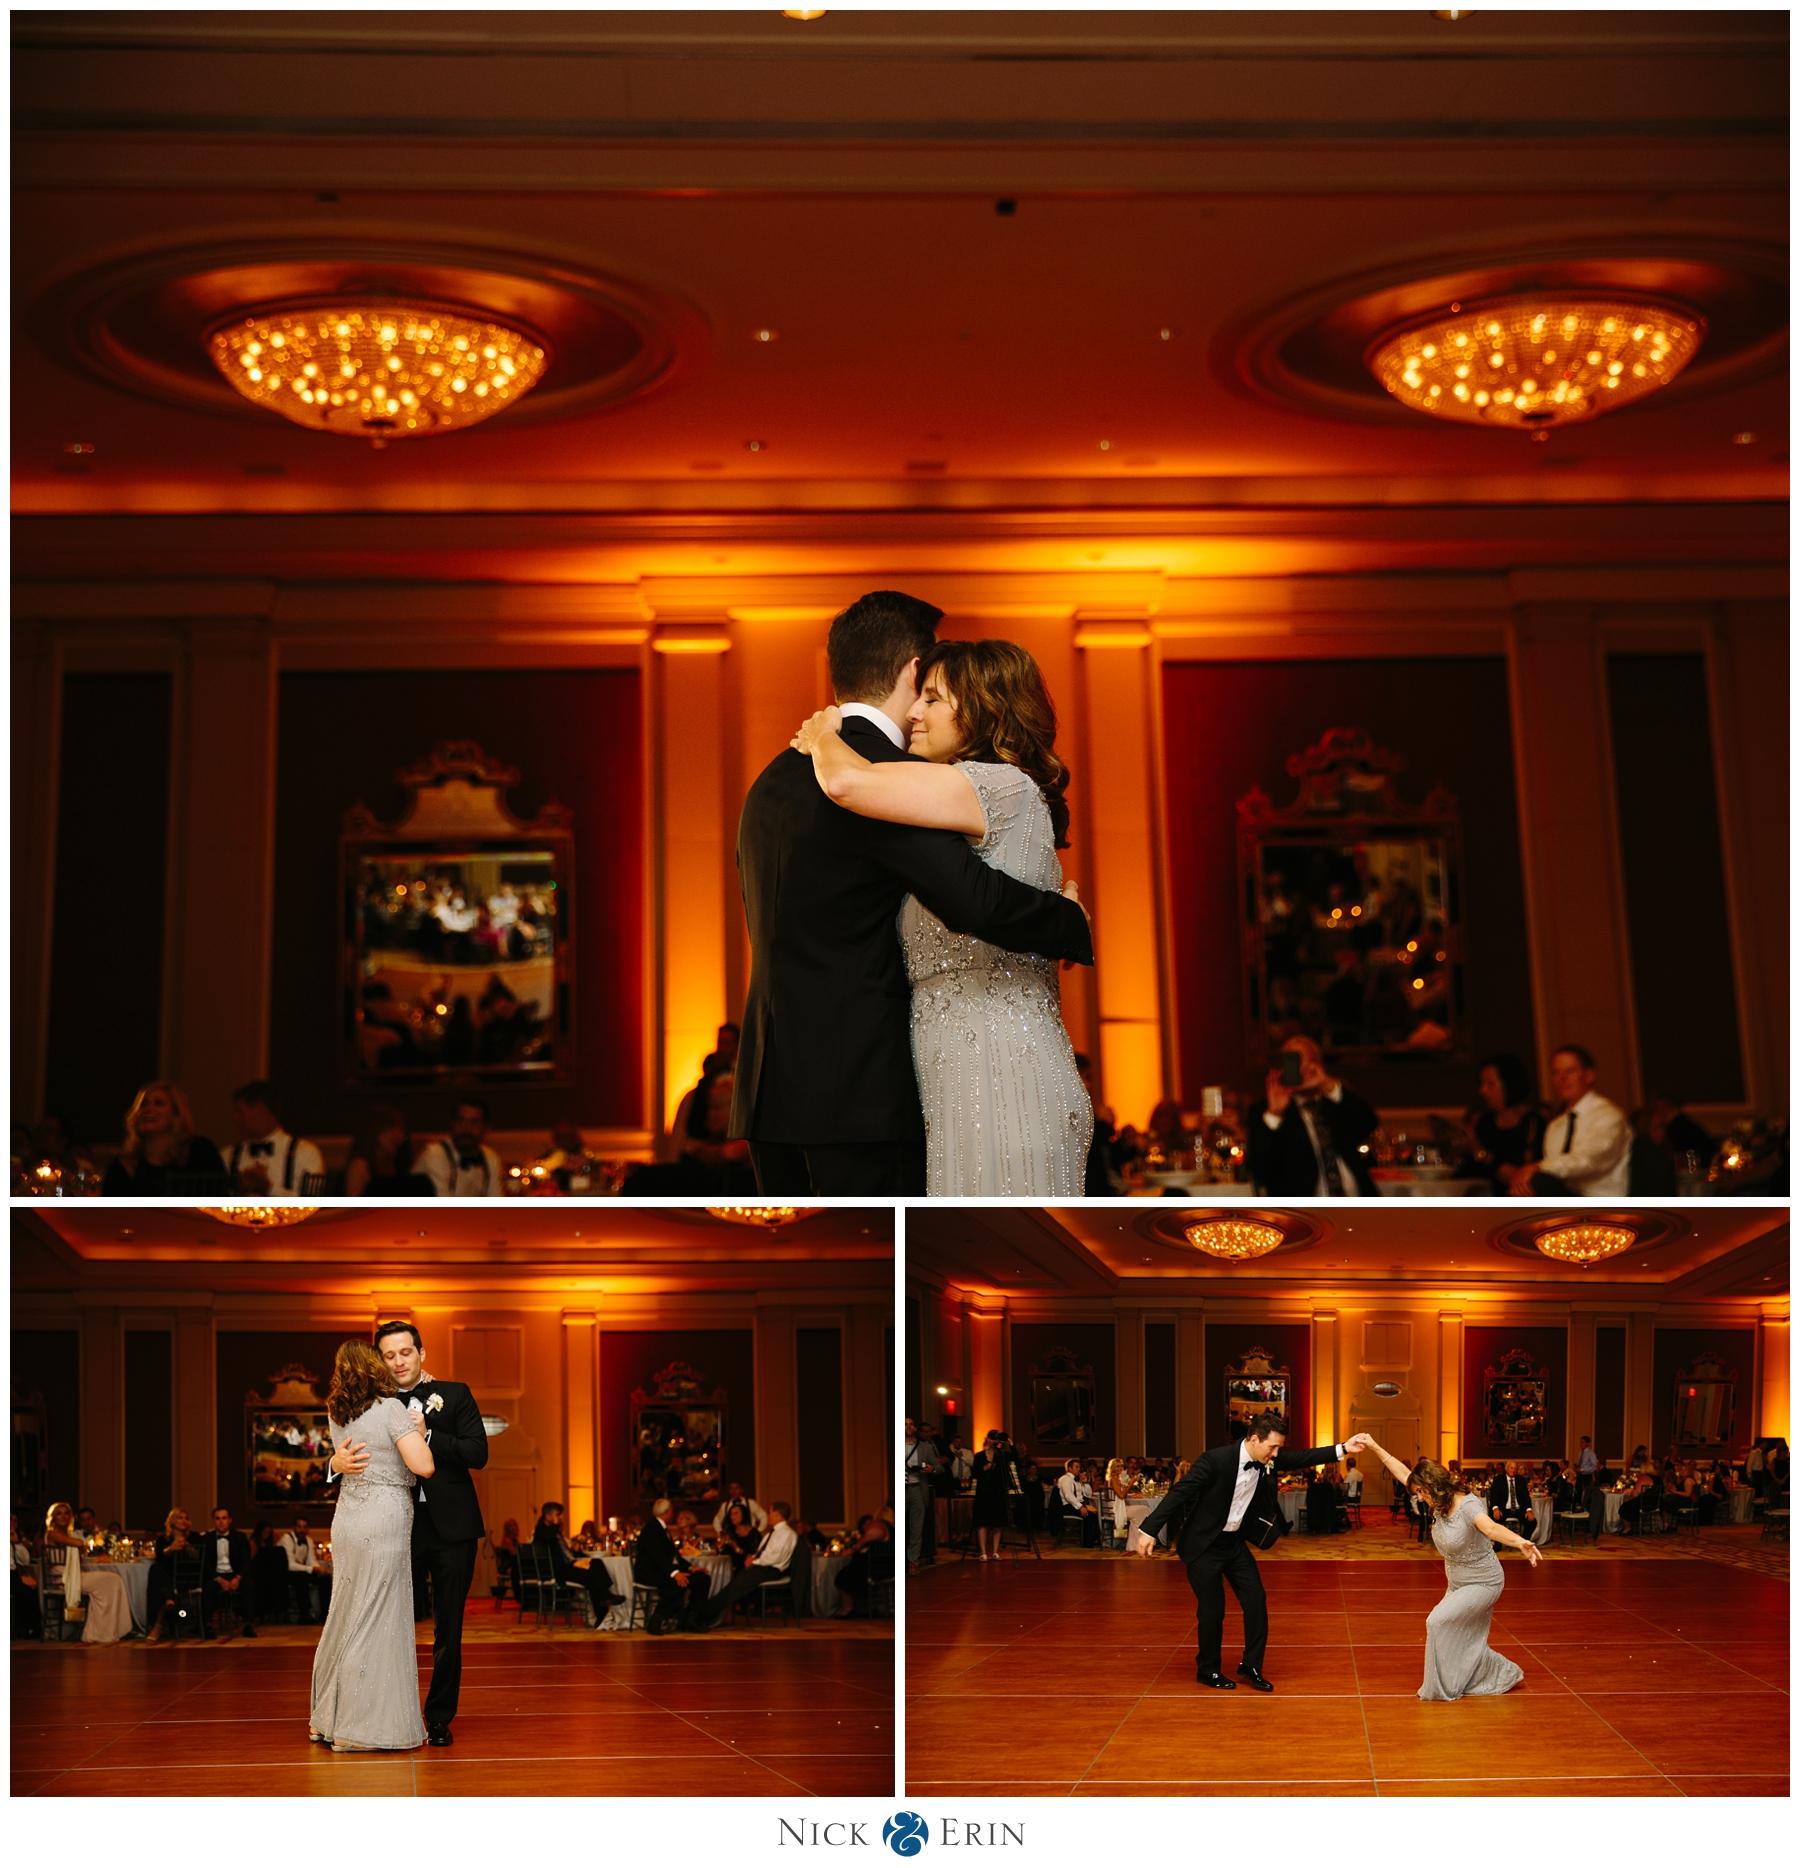 donner_photography_washington-dc-wedding_ariel-patrick_0073